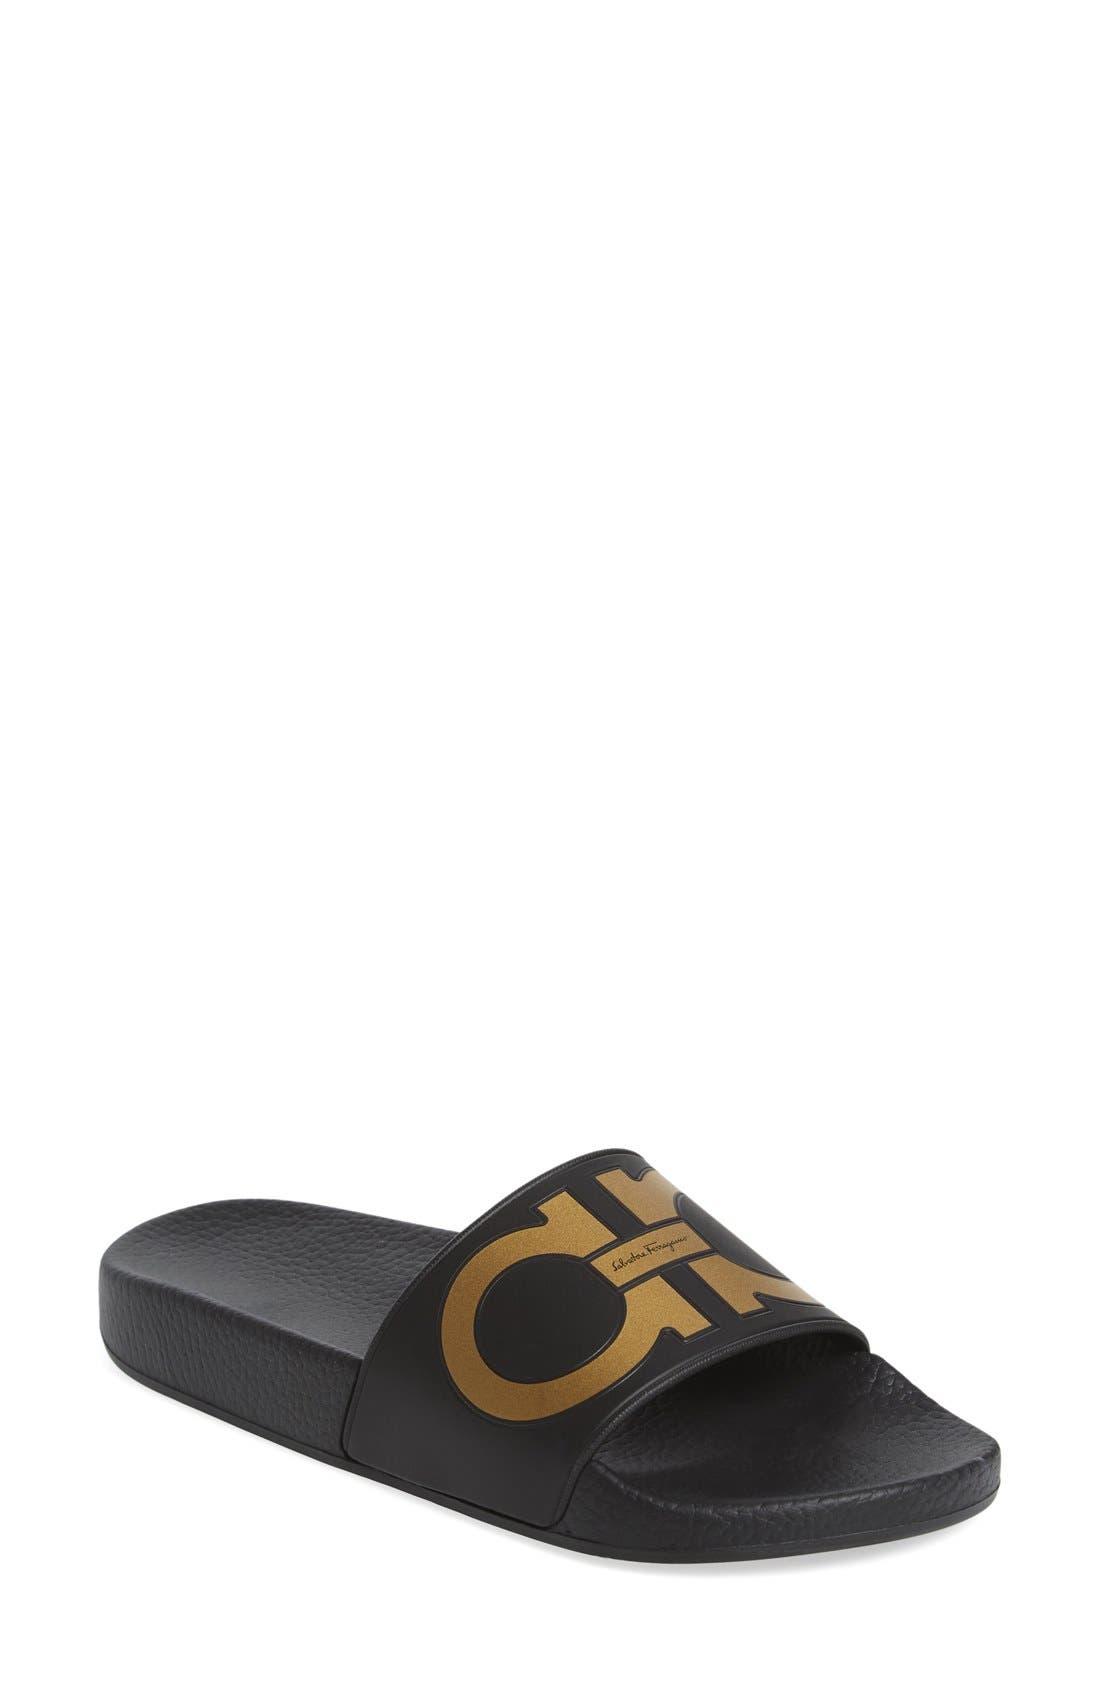 Salvatore Ferragamo Groove Logo Slide Sandal (Women)